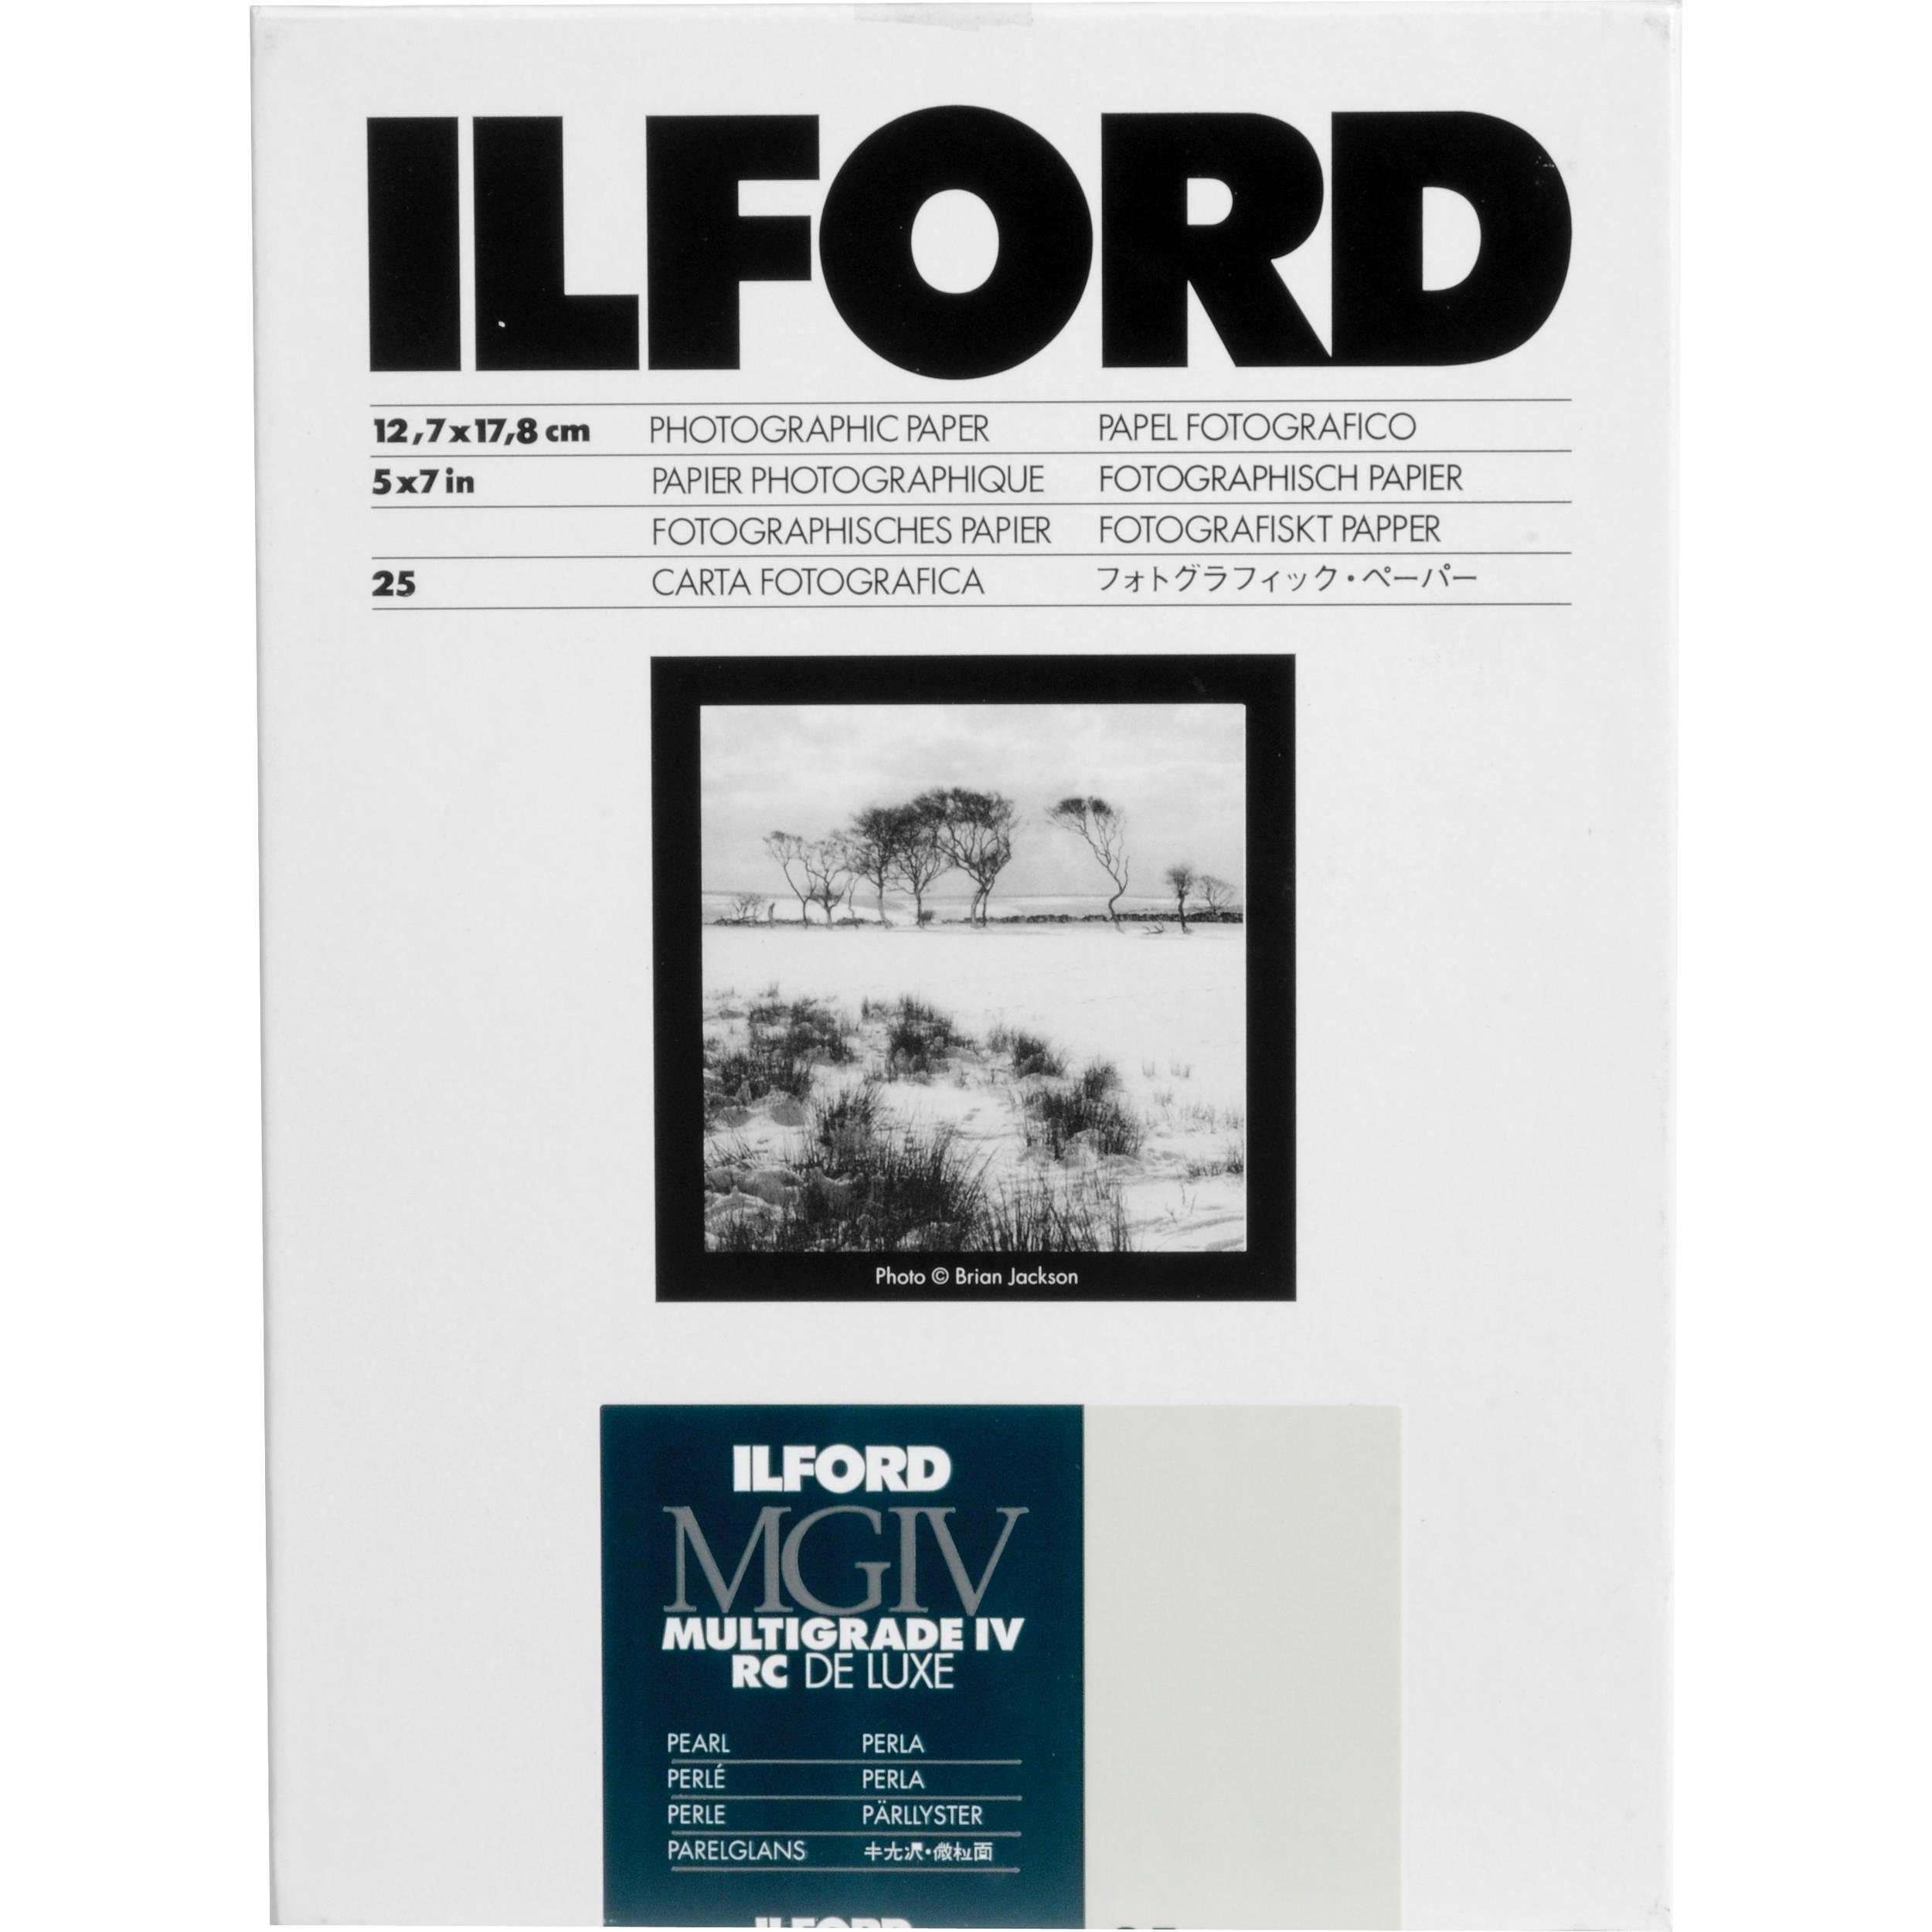 Ilford MGFB1K Fiber Based B & W Paper - amazon.com